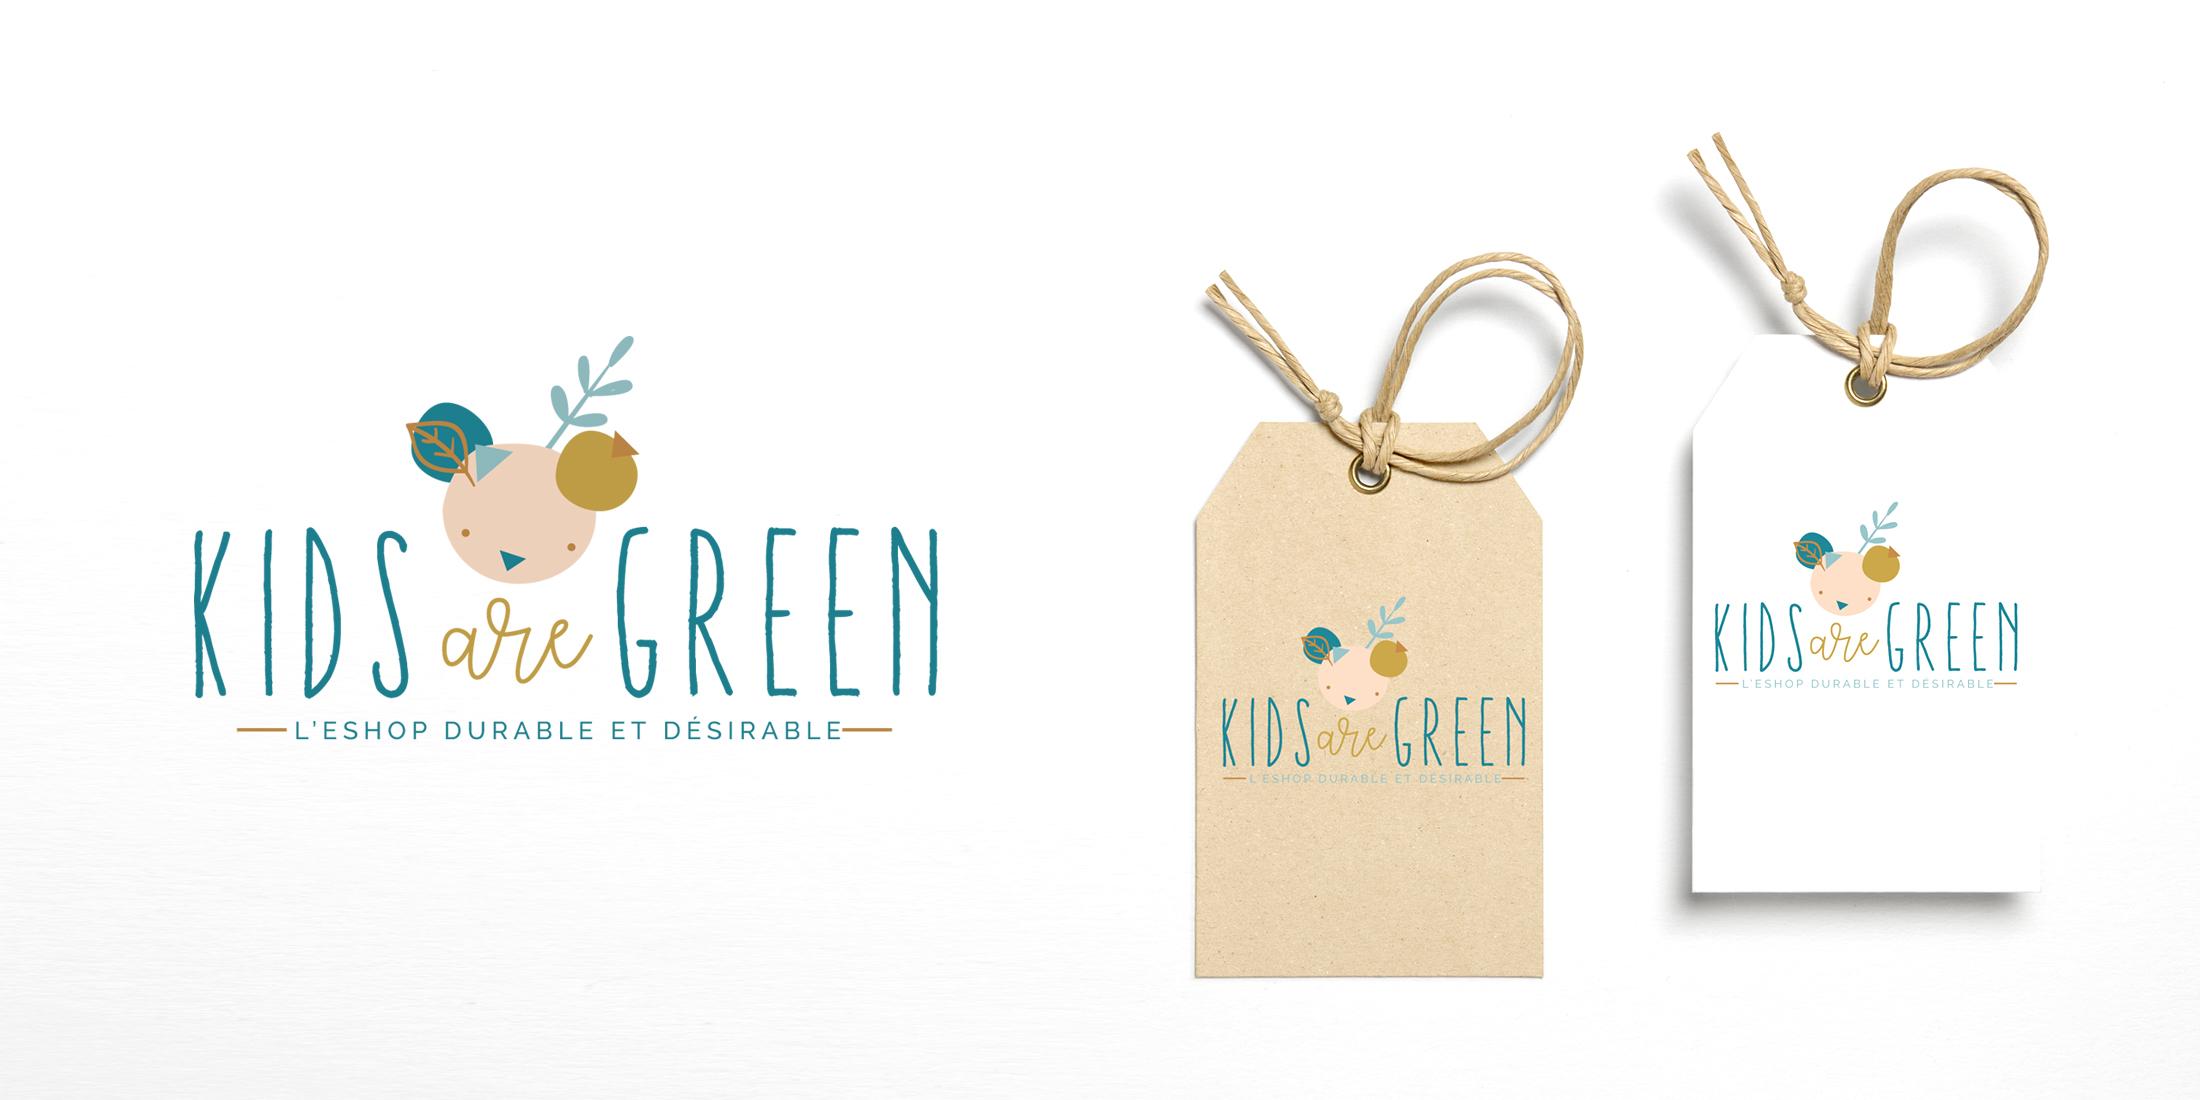 Kids are green Chic studio